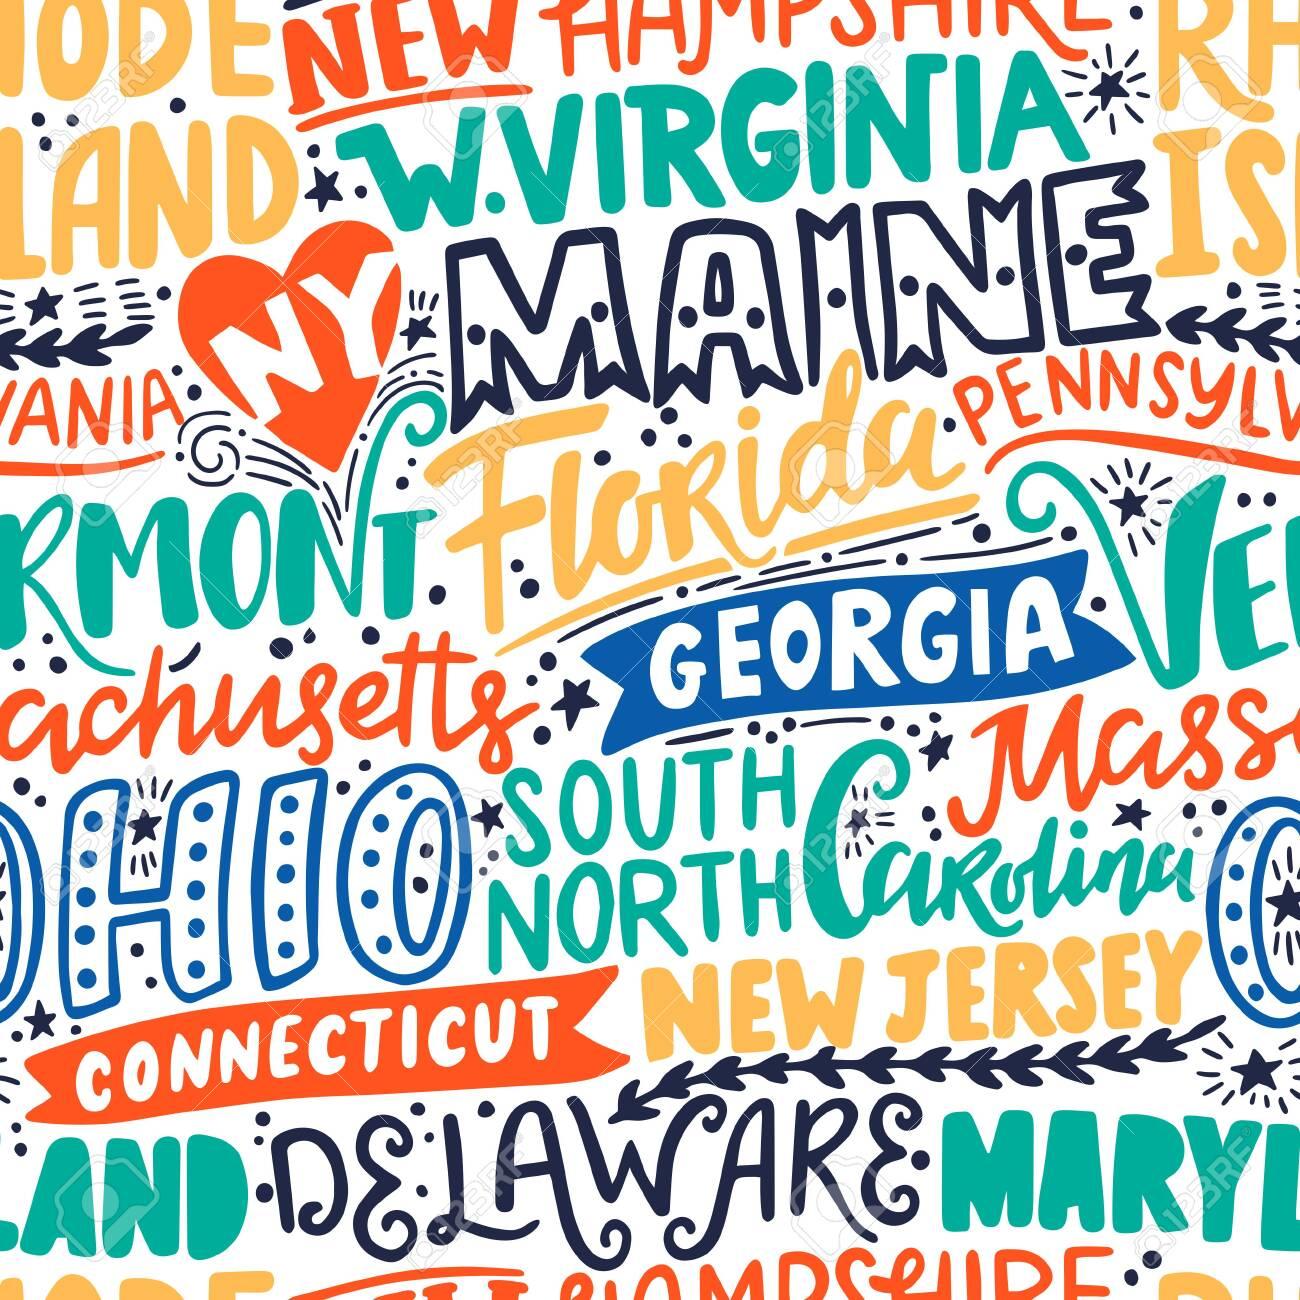 Vector seamless pattern with USA states. New York, Maine, Florida, Georgia, Vermont, Massachusetts, Ohio, Carolina, New Jersey, Connecticut, Maryland, Delaware, Virginia, Rhode Island, Pennsylvania - 149823750